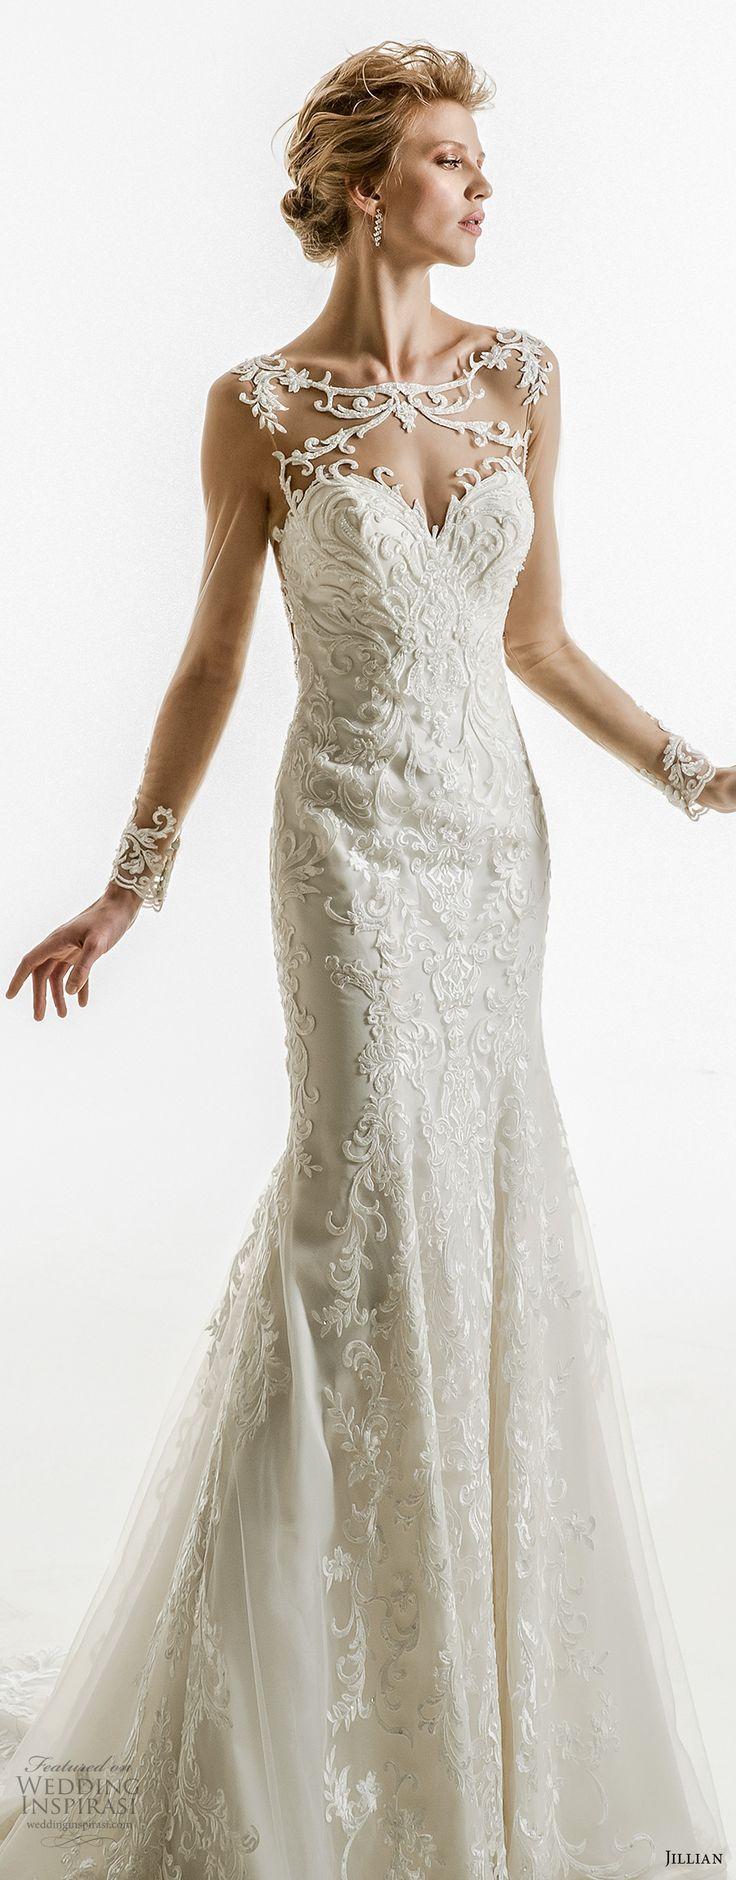 Jillian 2018 Wedding Dresses Wedding dresses, Bridal